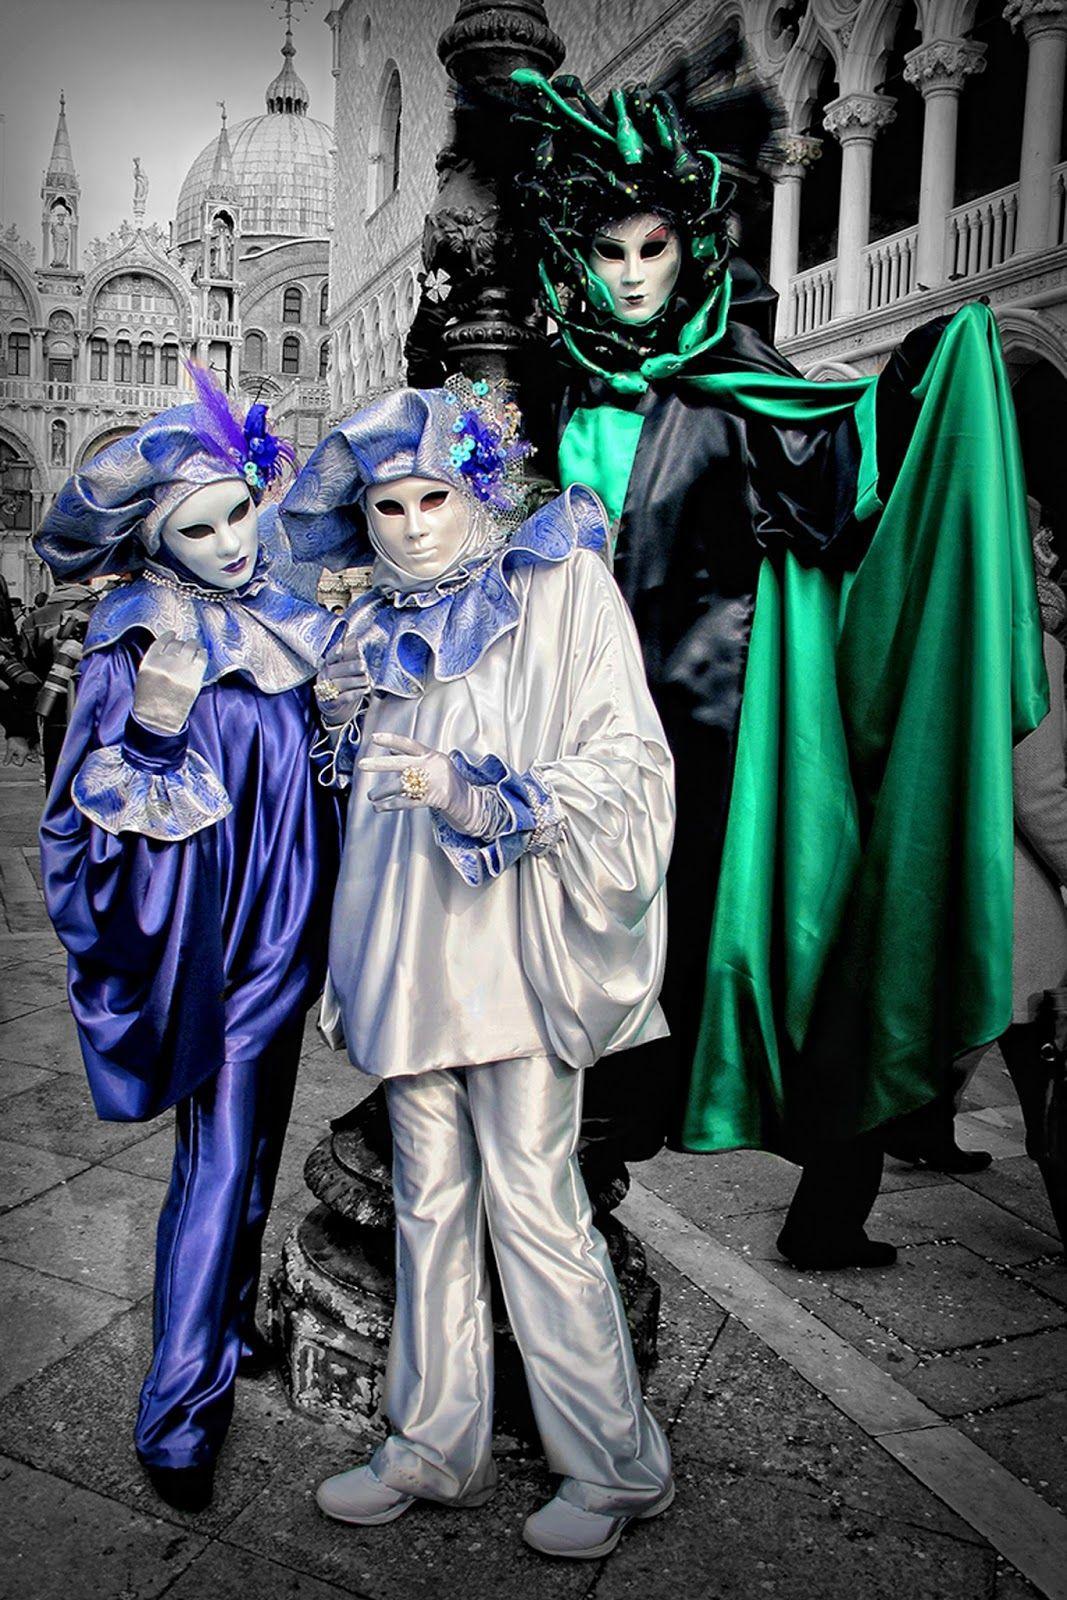 Carnaval Veneciano - Venetian Carnival | САRNIVAL | Pinterest - photo#44